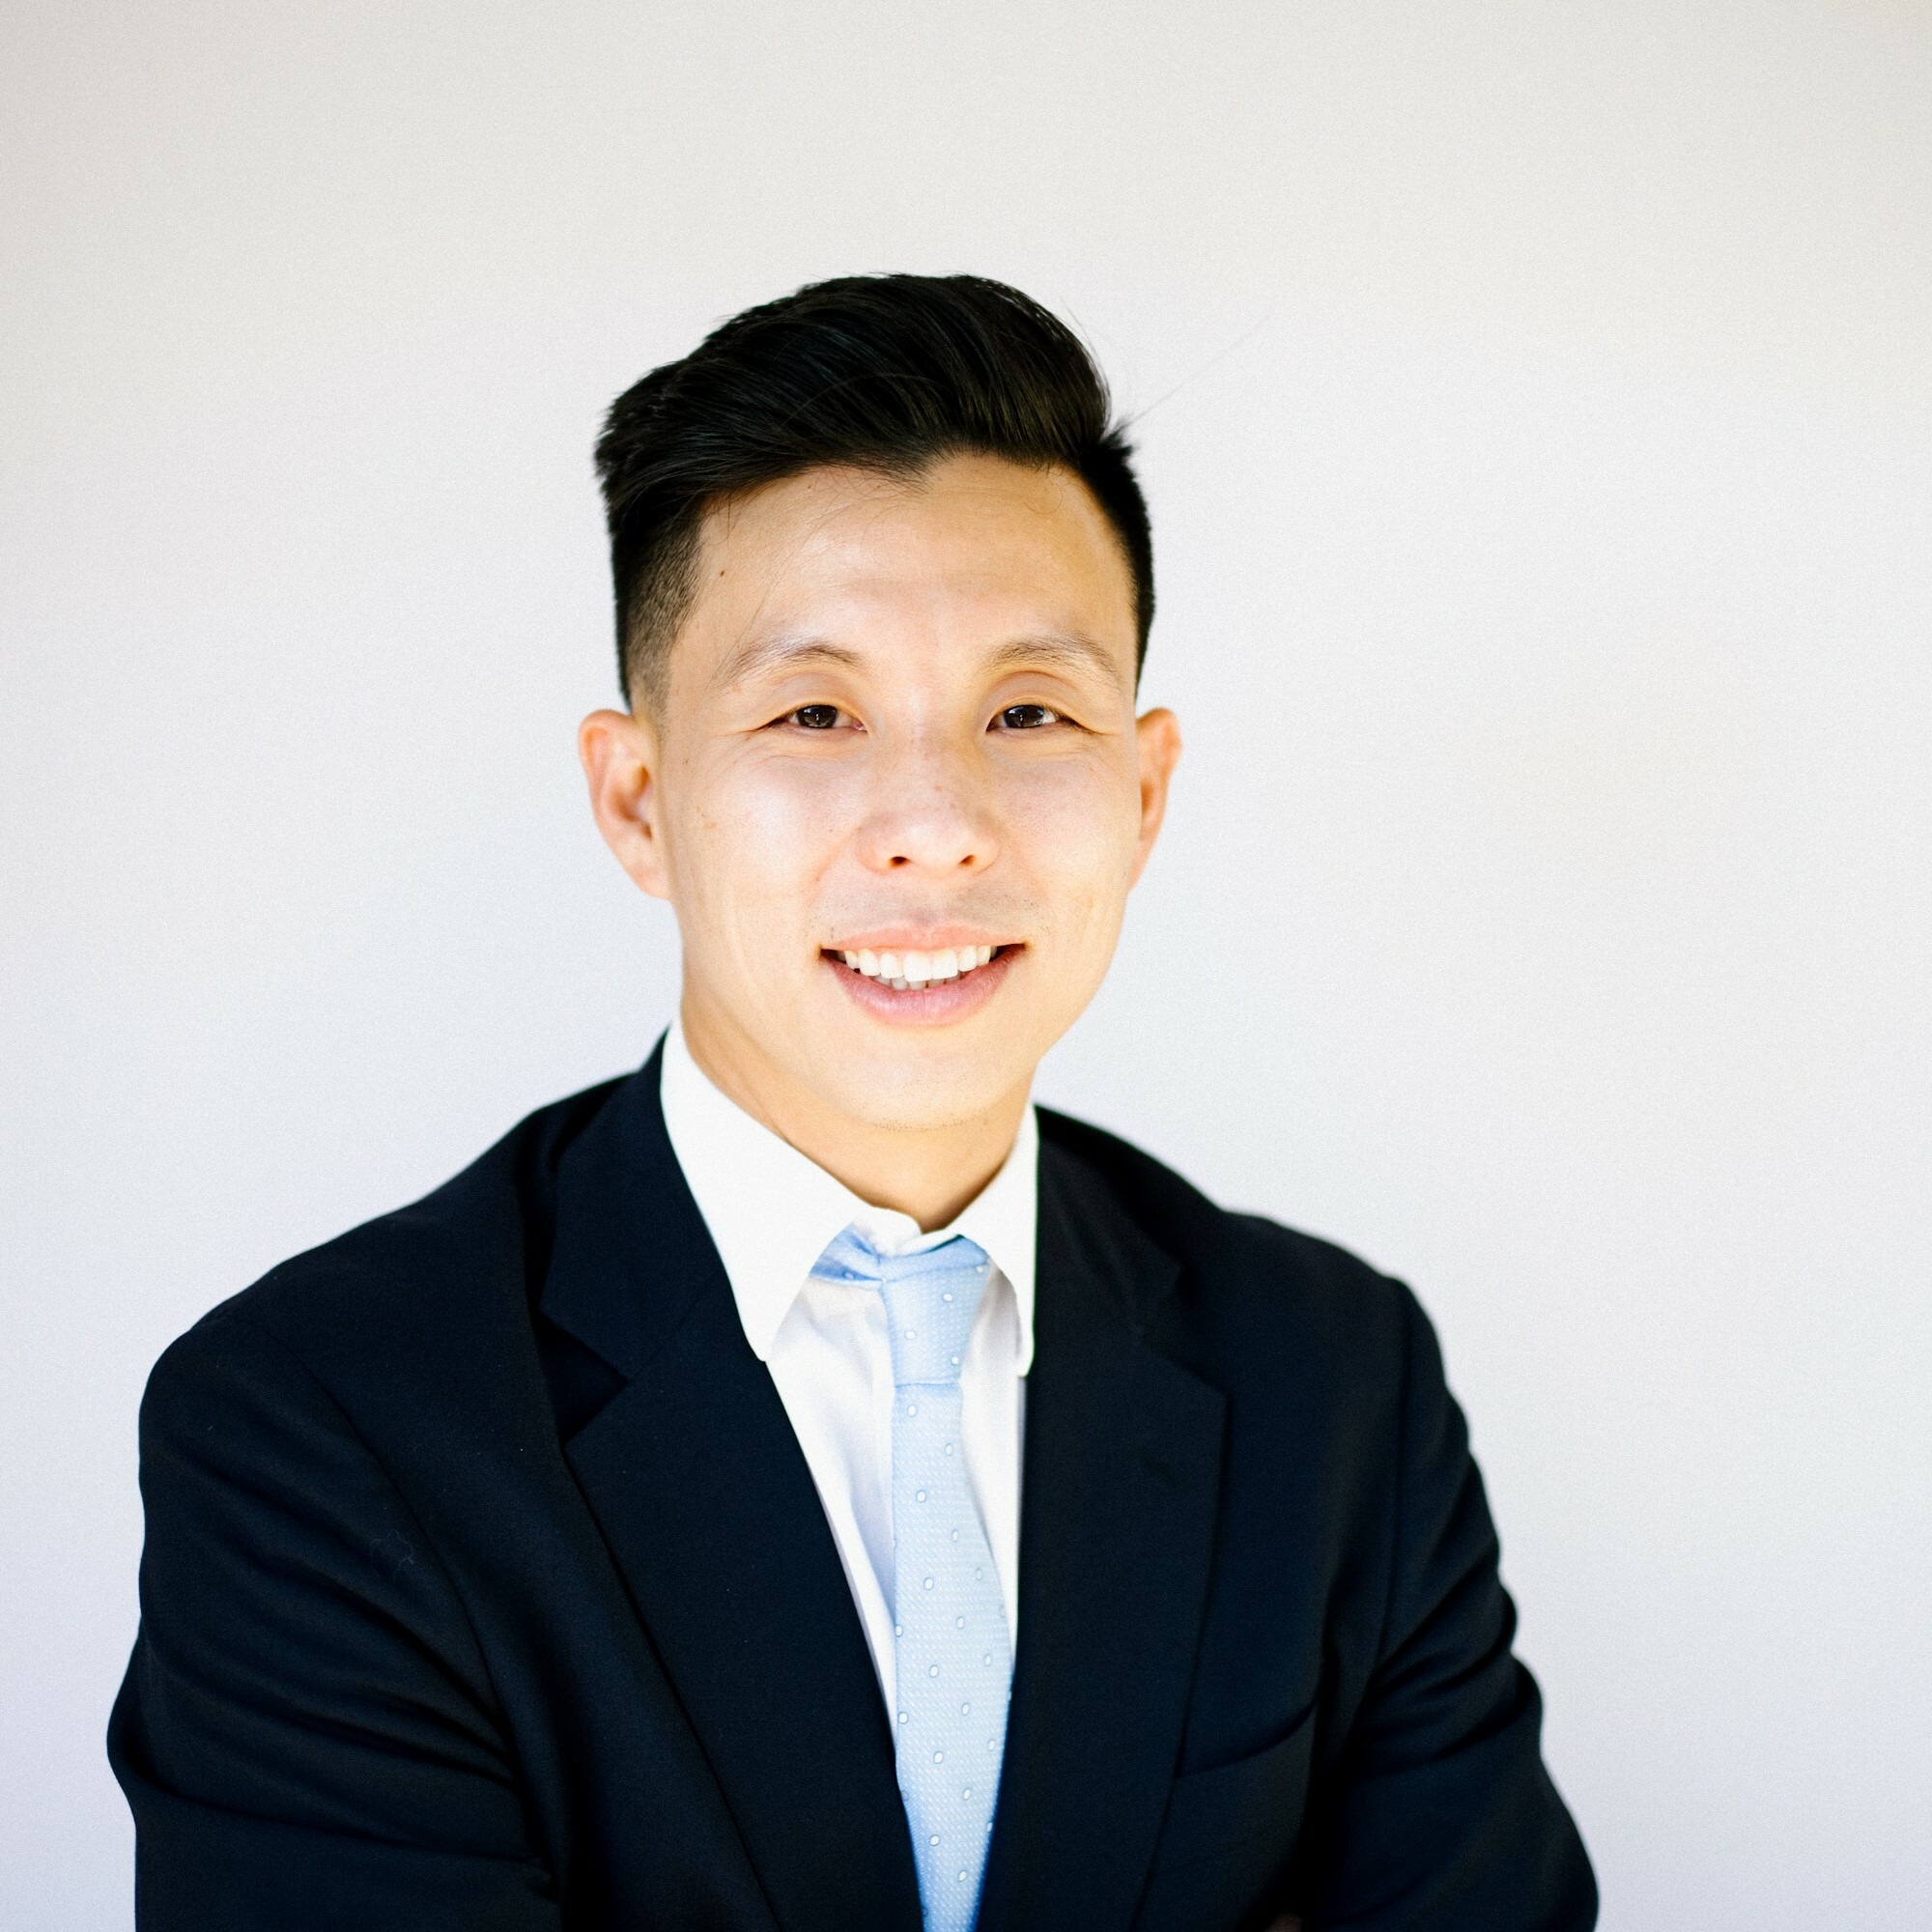 Portrait of Jesse Hsieh